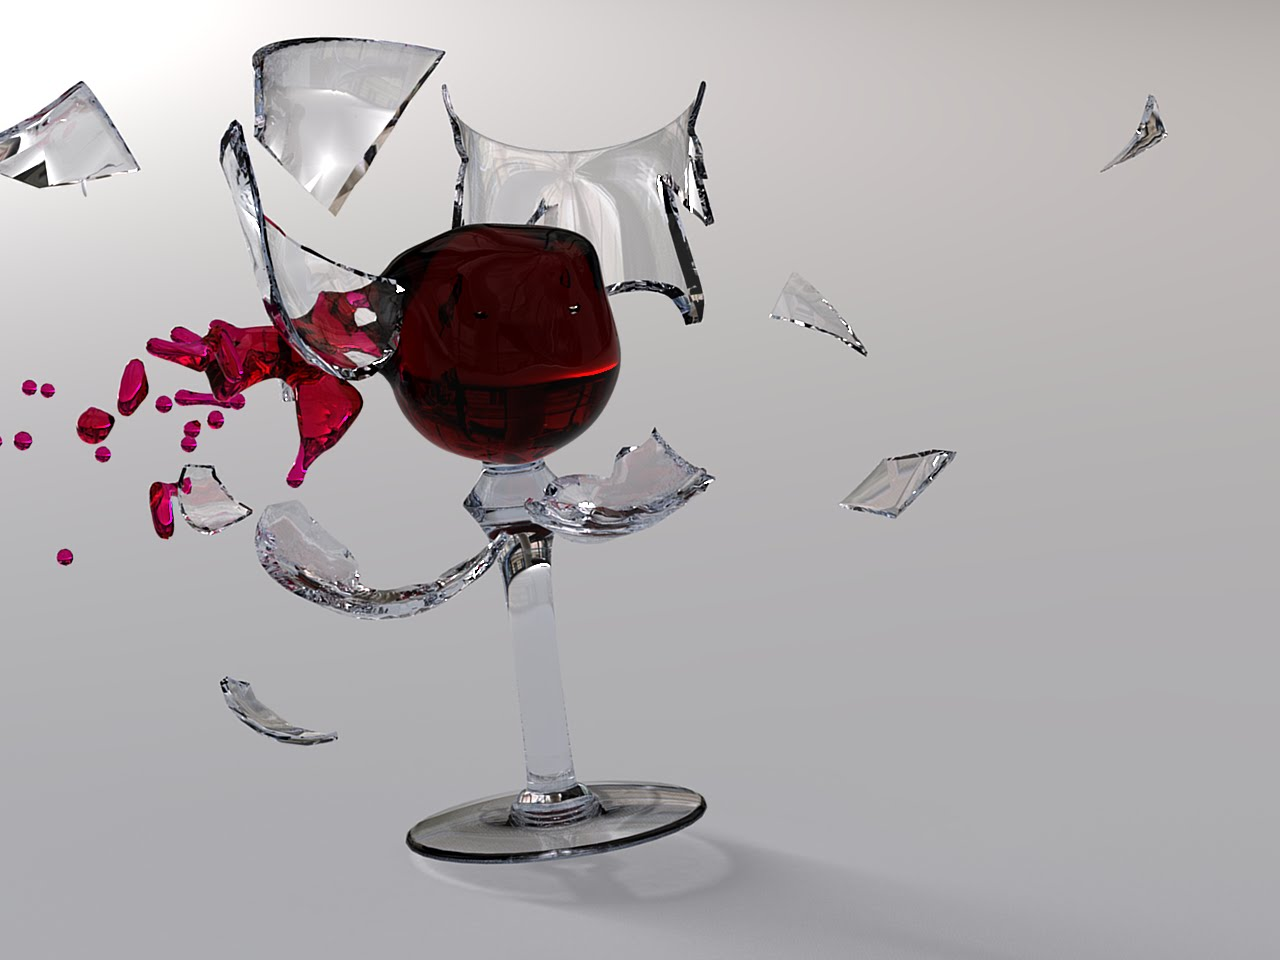 https://4.bp.blogspot.com/_7pv0LpGTI1Y/TLiuOQq00CI/AAAAAAAAA2A/UiT-DUj2LpM/s1600/Glass+13.jpg